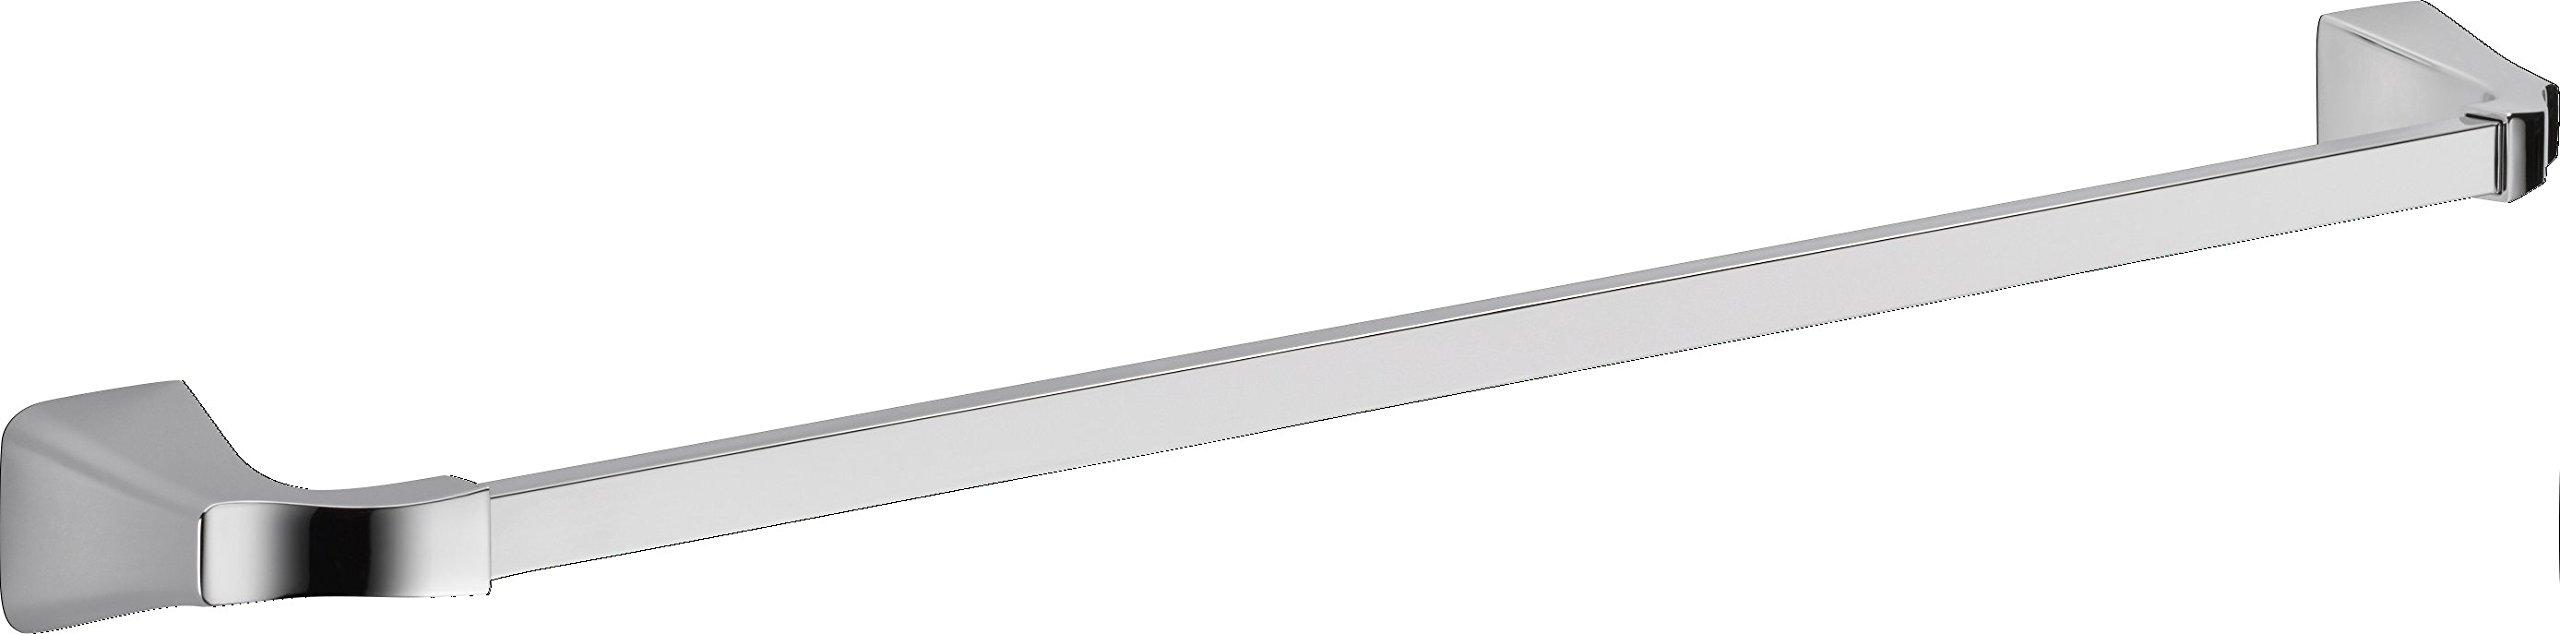 Delta Faucet 75230 Tesla Towel Bar, Chrome, 30''